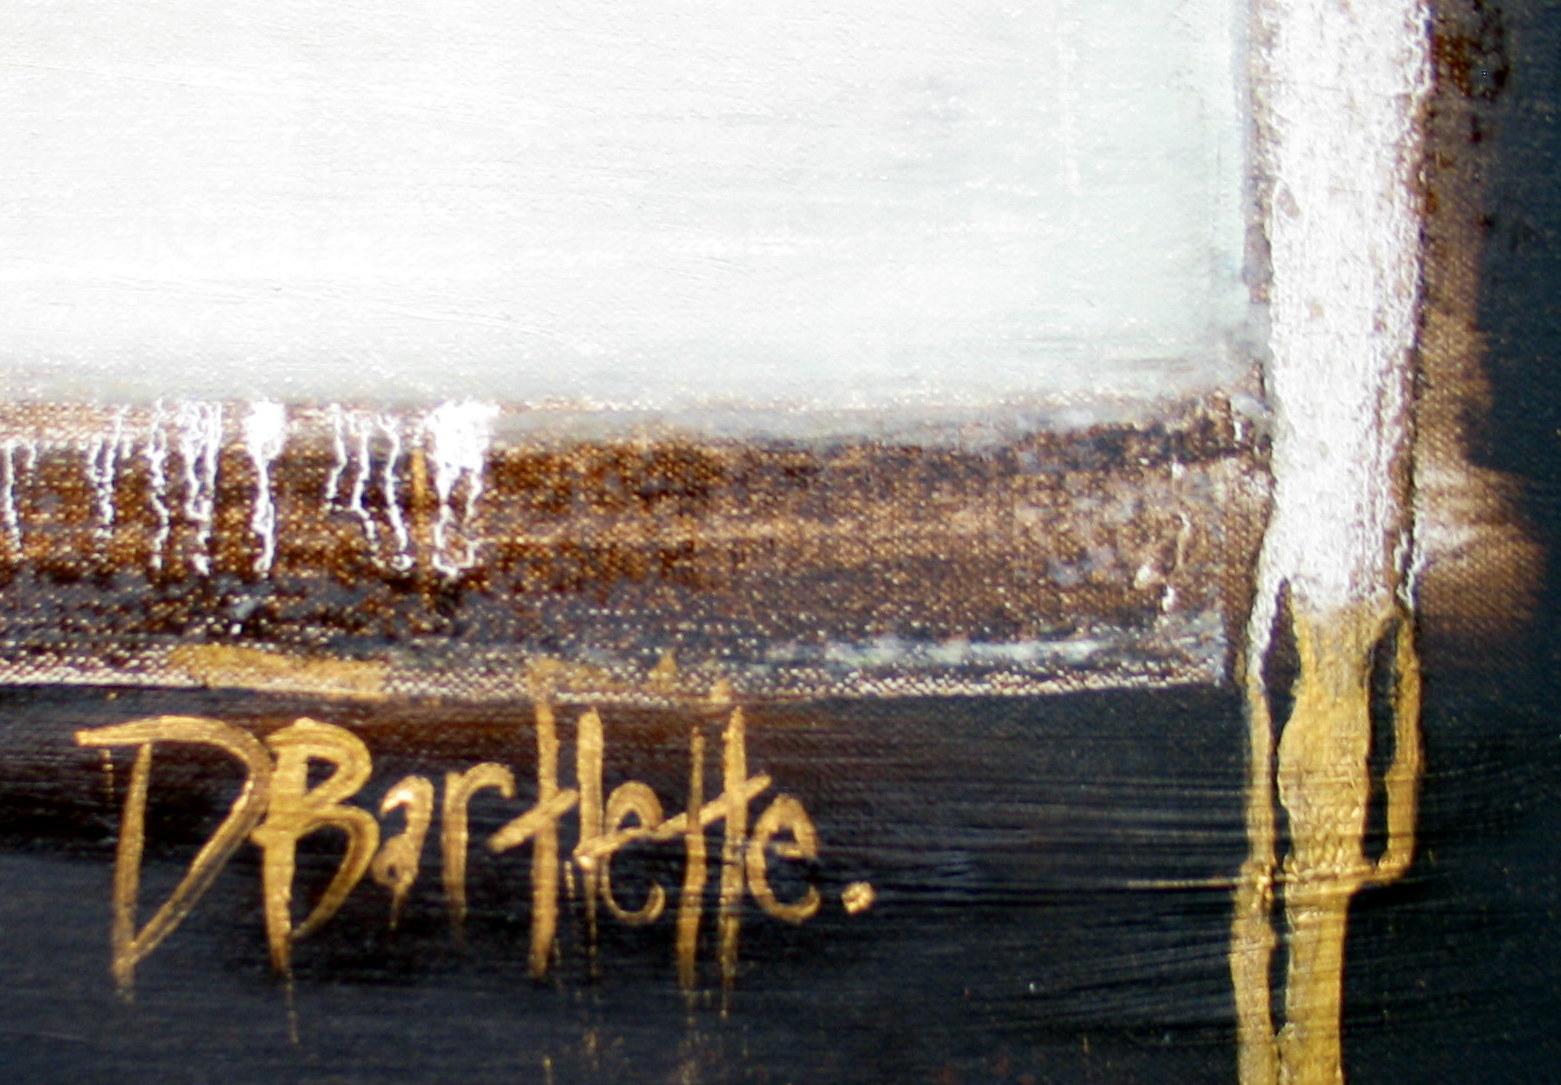 Danielle Bartlette's Signature